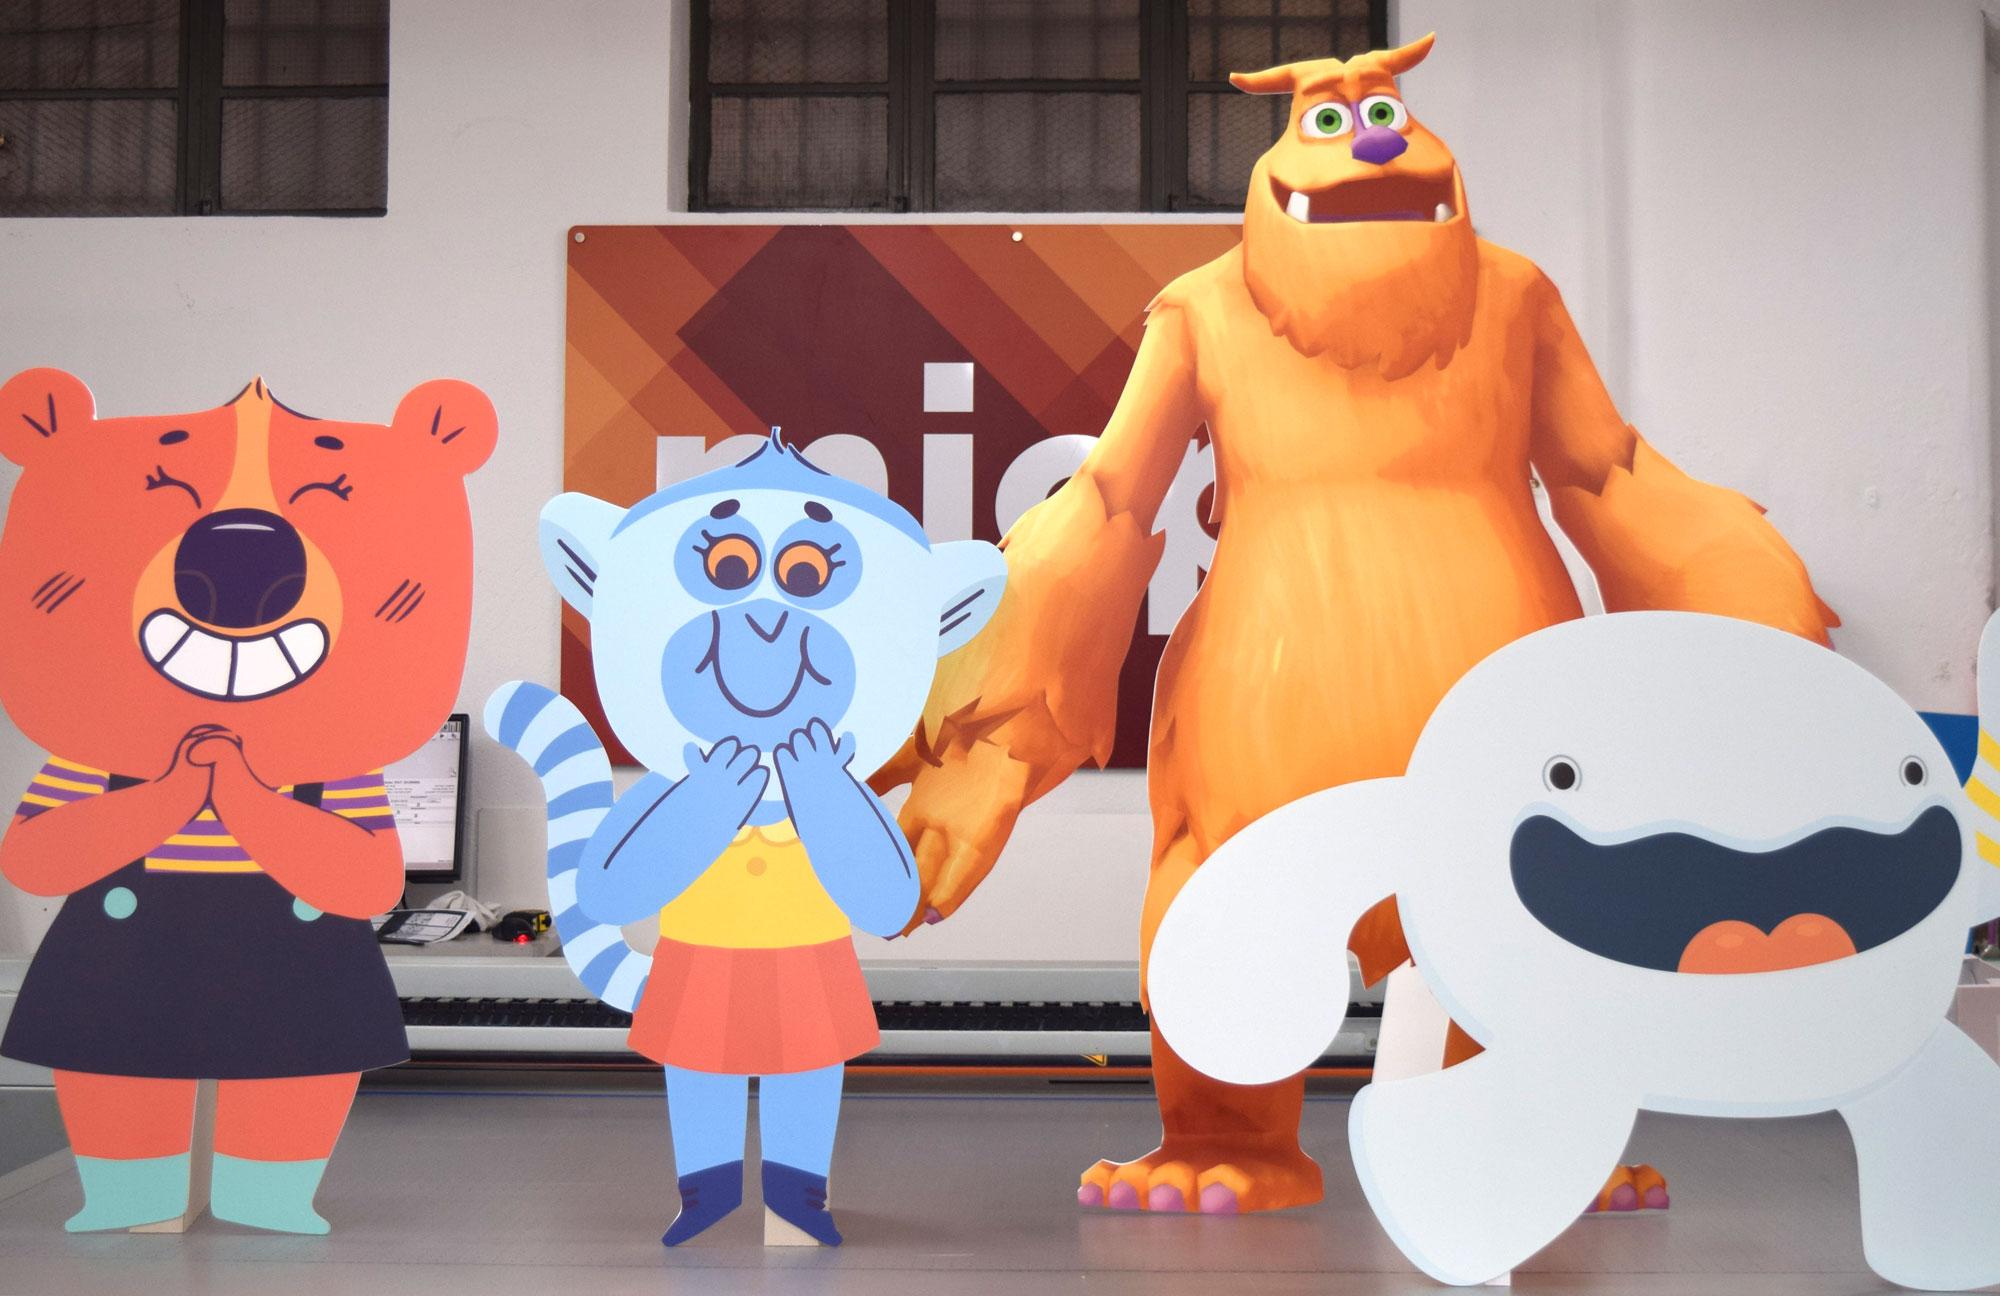 Lifesize Cardboard Characters